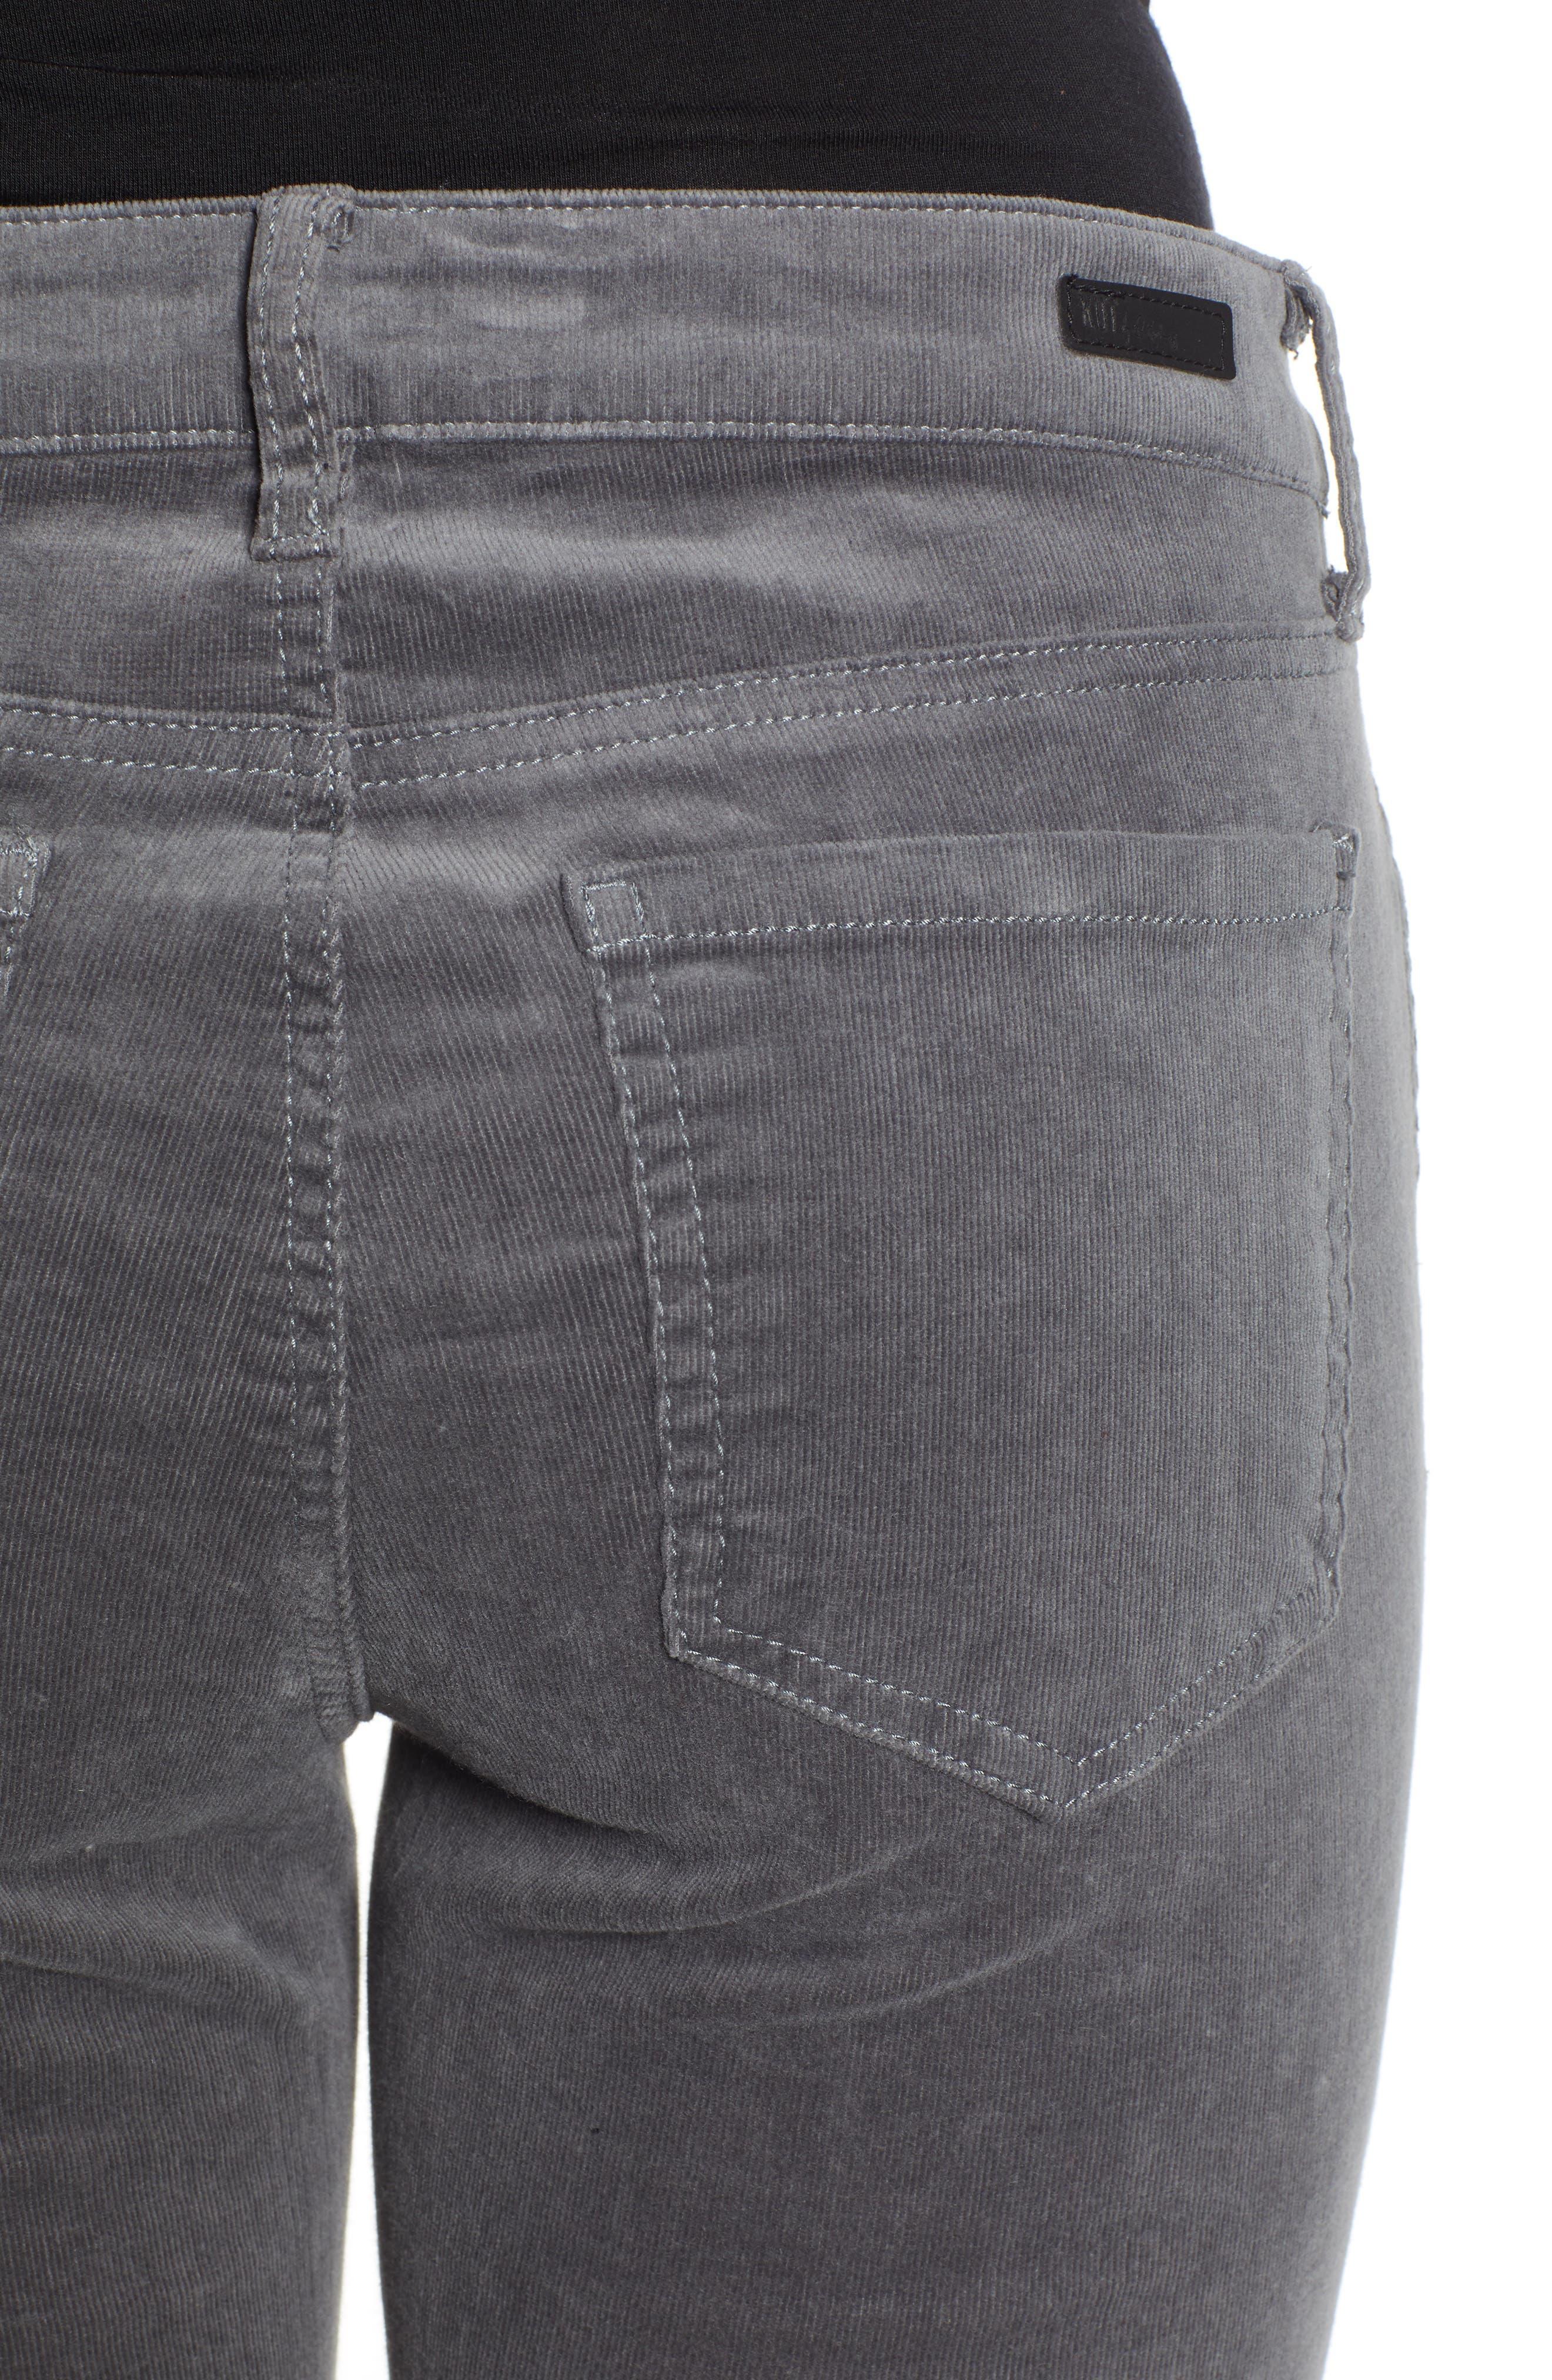 'Diana' Stretch Corduroy Skinny Pants,                             Alternate thumbnail 160, color,